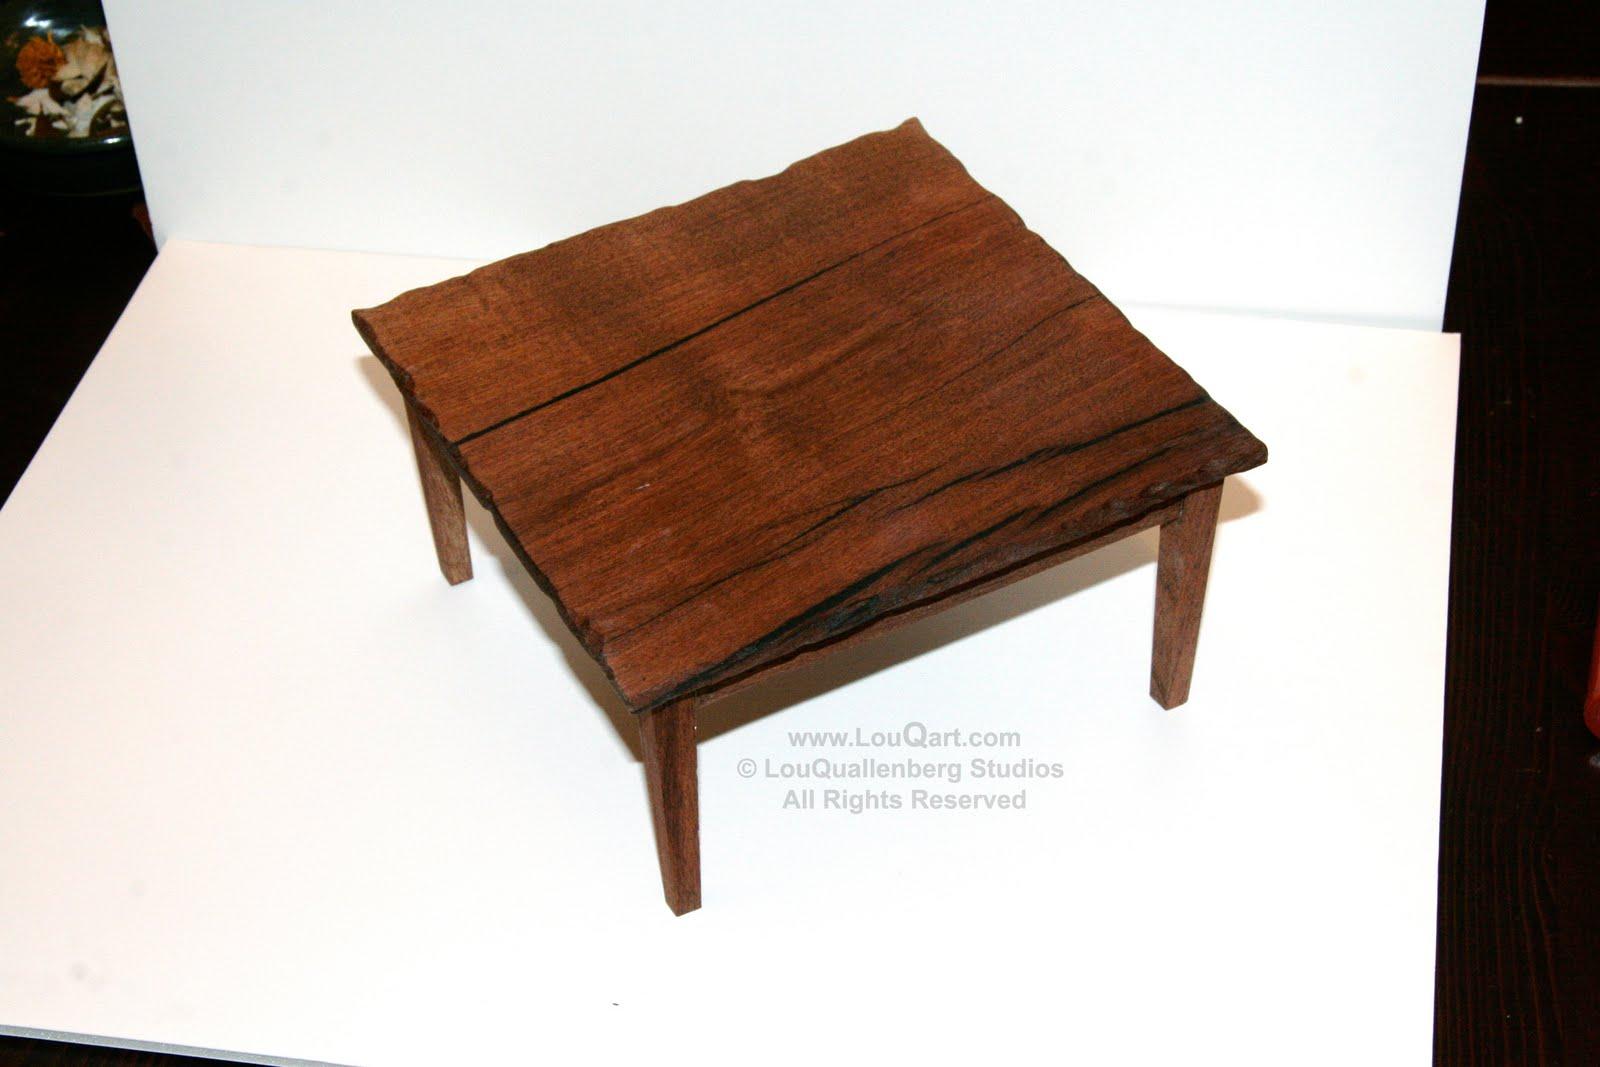 Square Mesquite Table Model